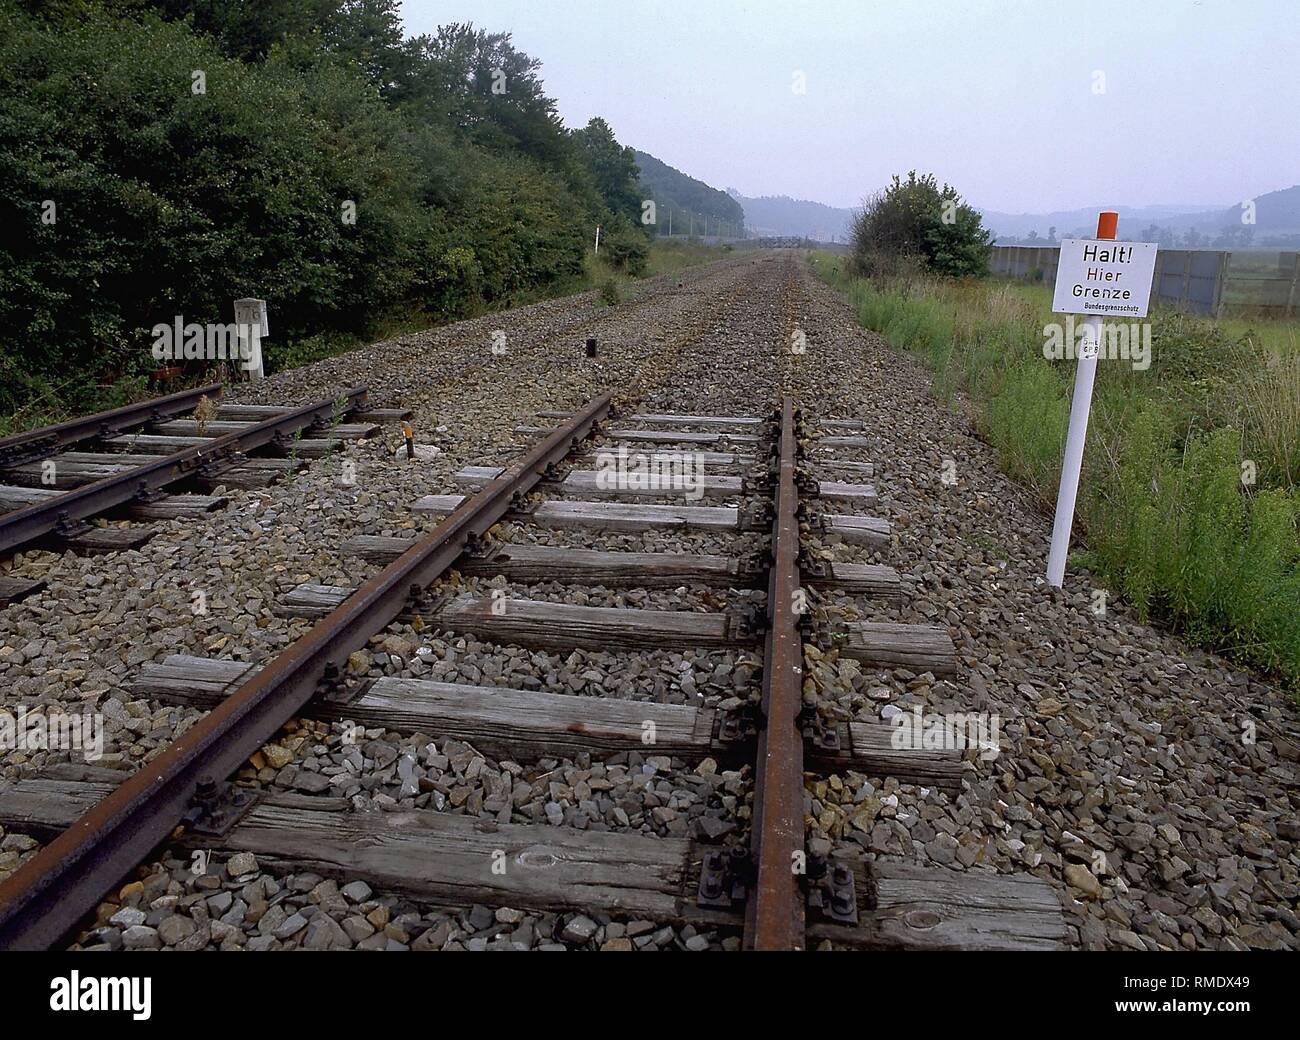 Dismantled railway line at Herleshausen / Wommen in Hesse. - Stock Image